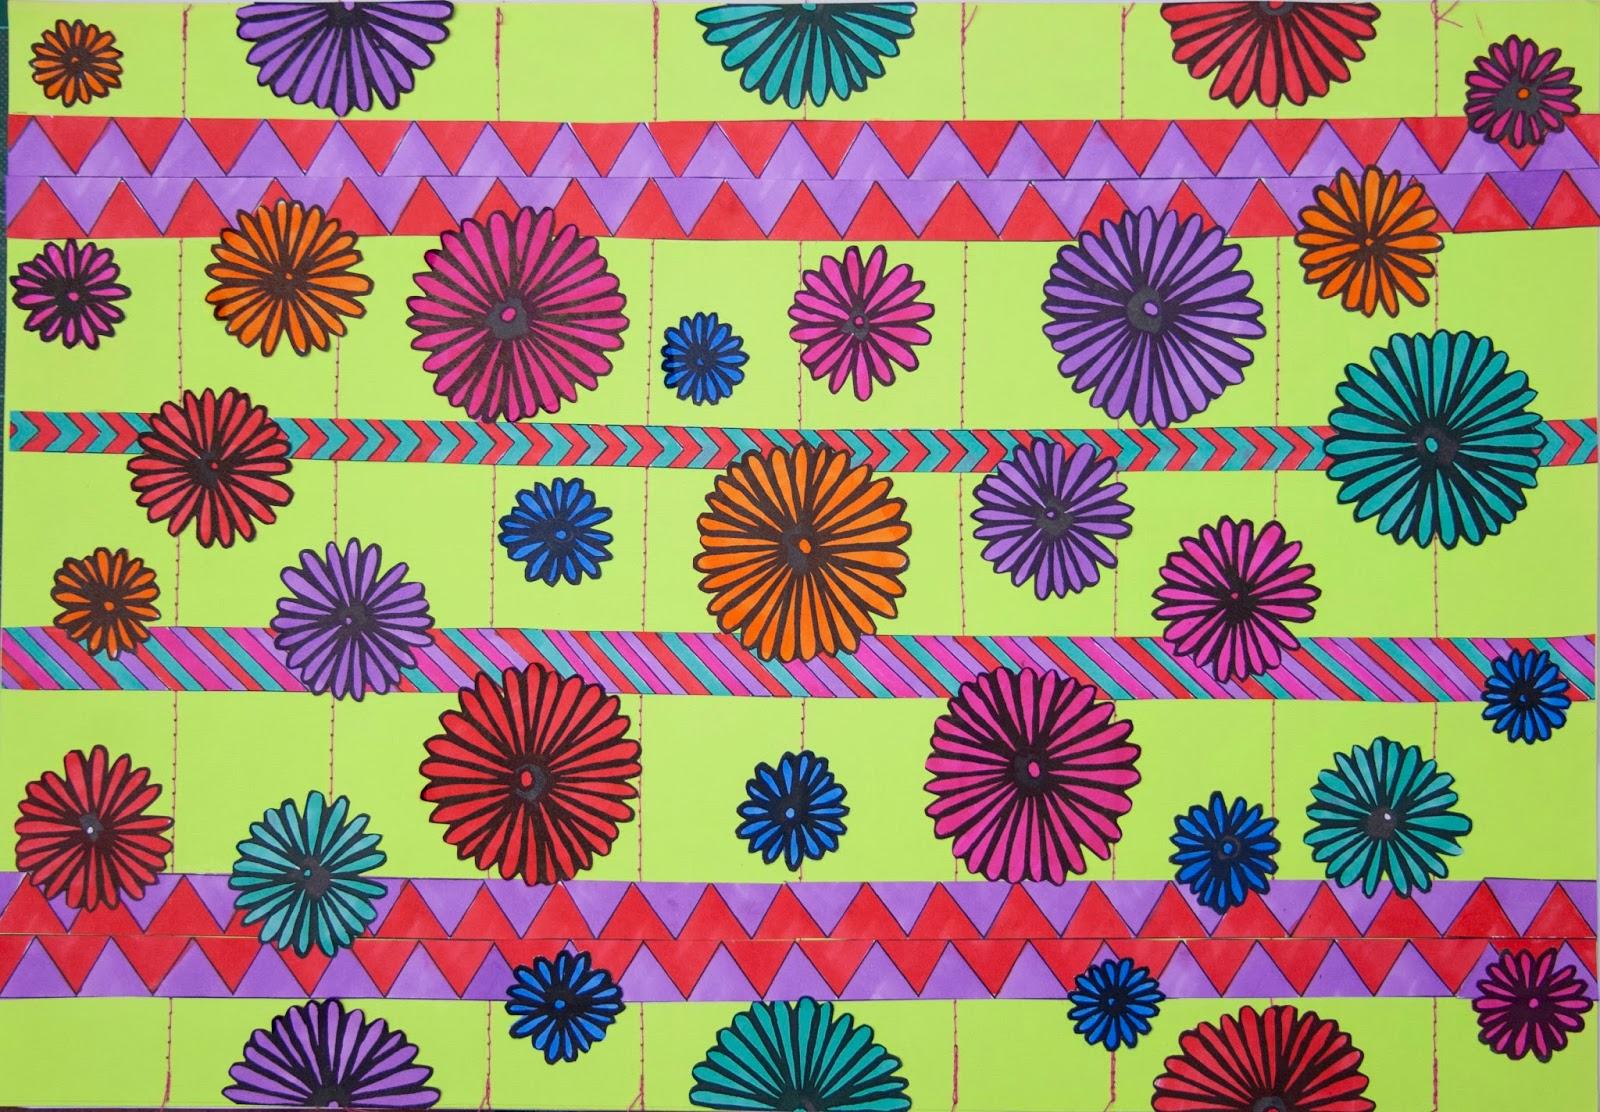 El amor es todo dise o textil - Disenos textiles del mediterraneo ...